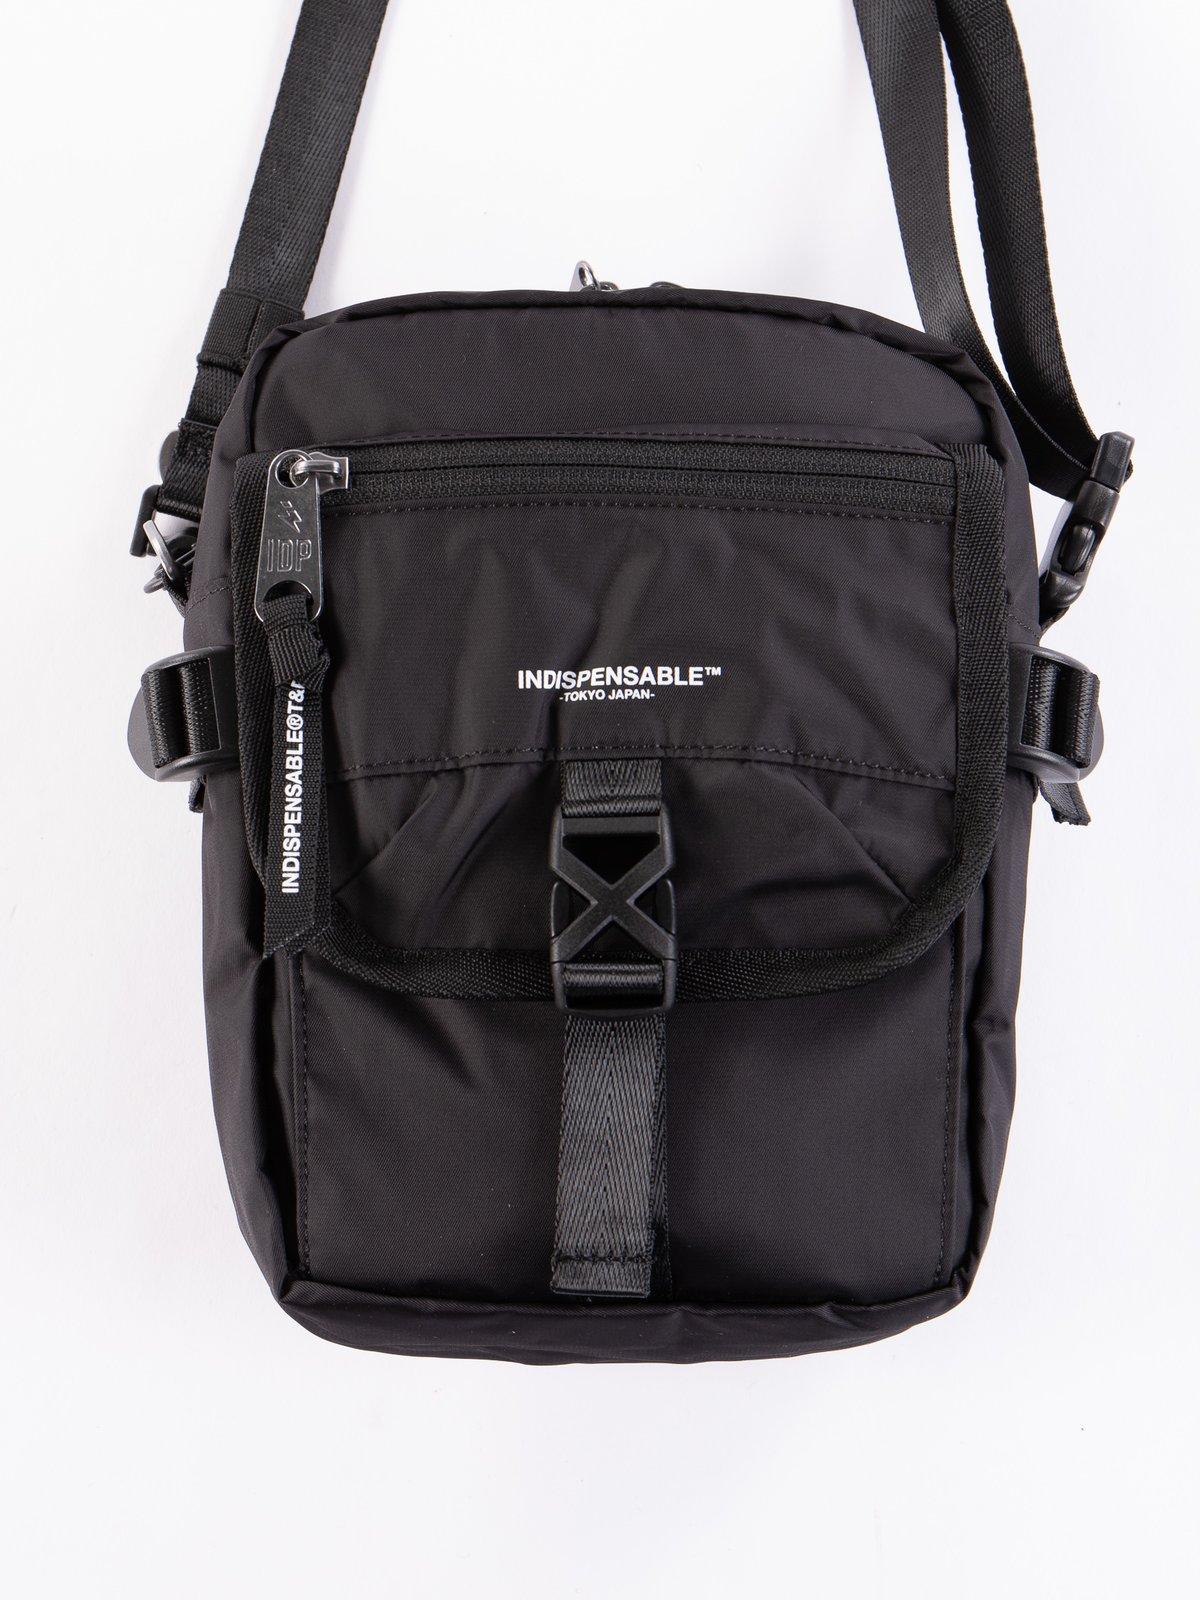 Black Econyl Buddy IDP Quick Shoulder Bag - Image 2